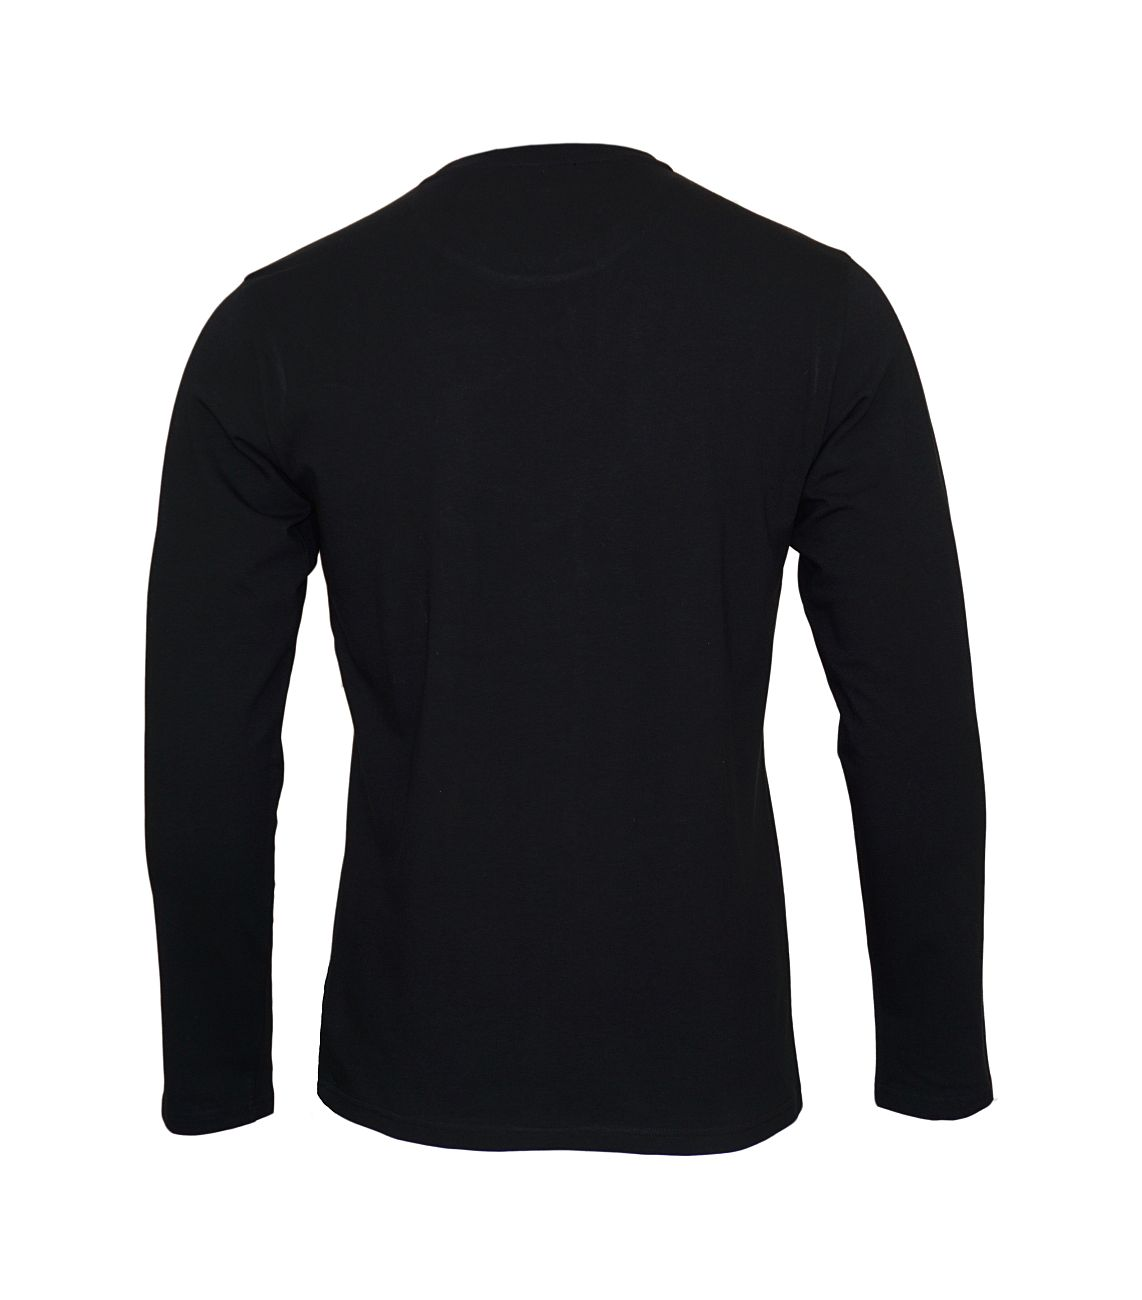 Emporio Armani Longsleeve Rundhals Shirt 111653 8A516 00020 NERO WX18-EAL